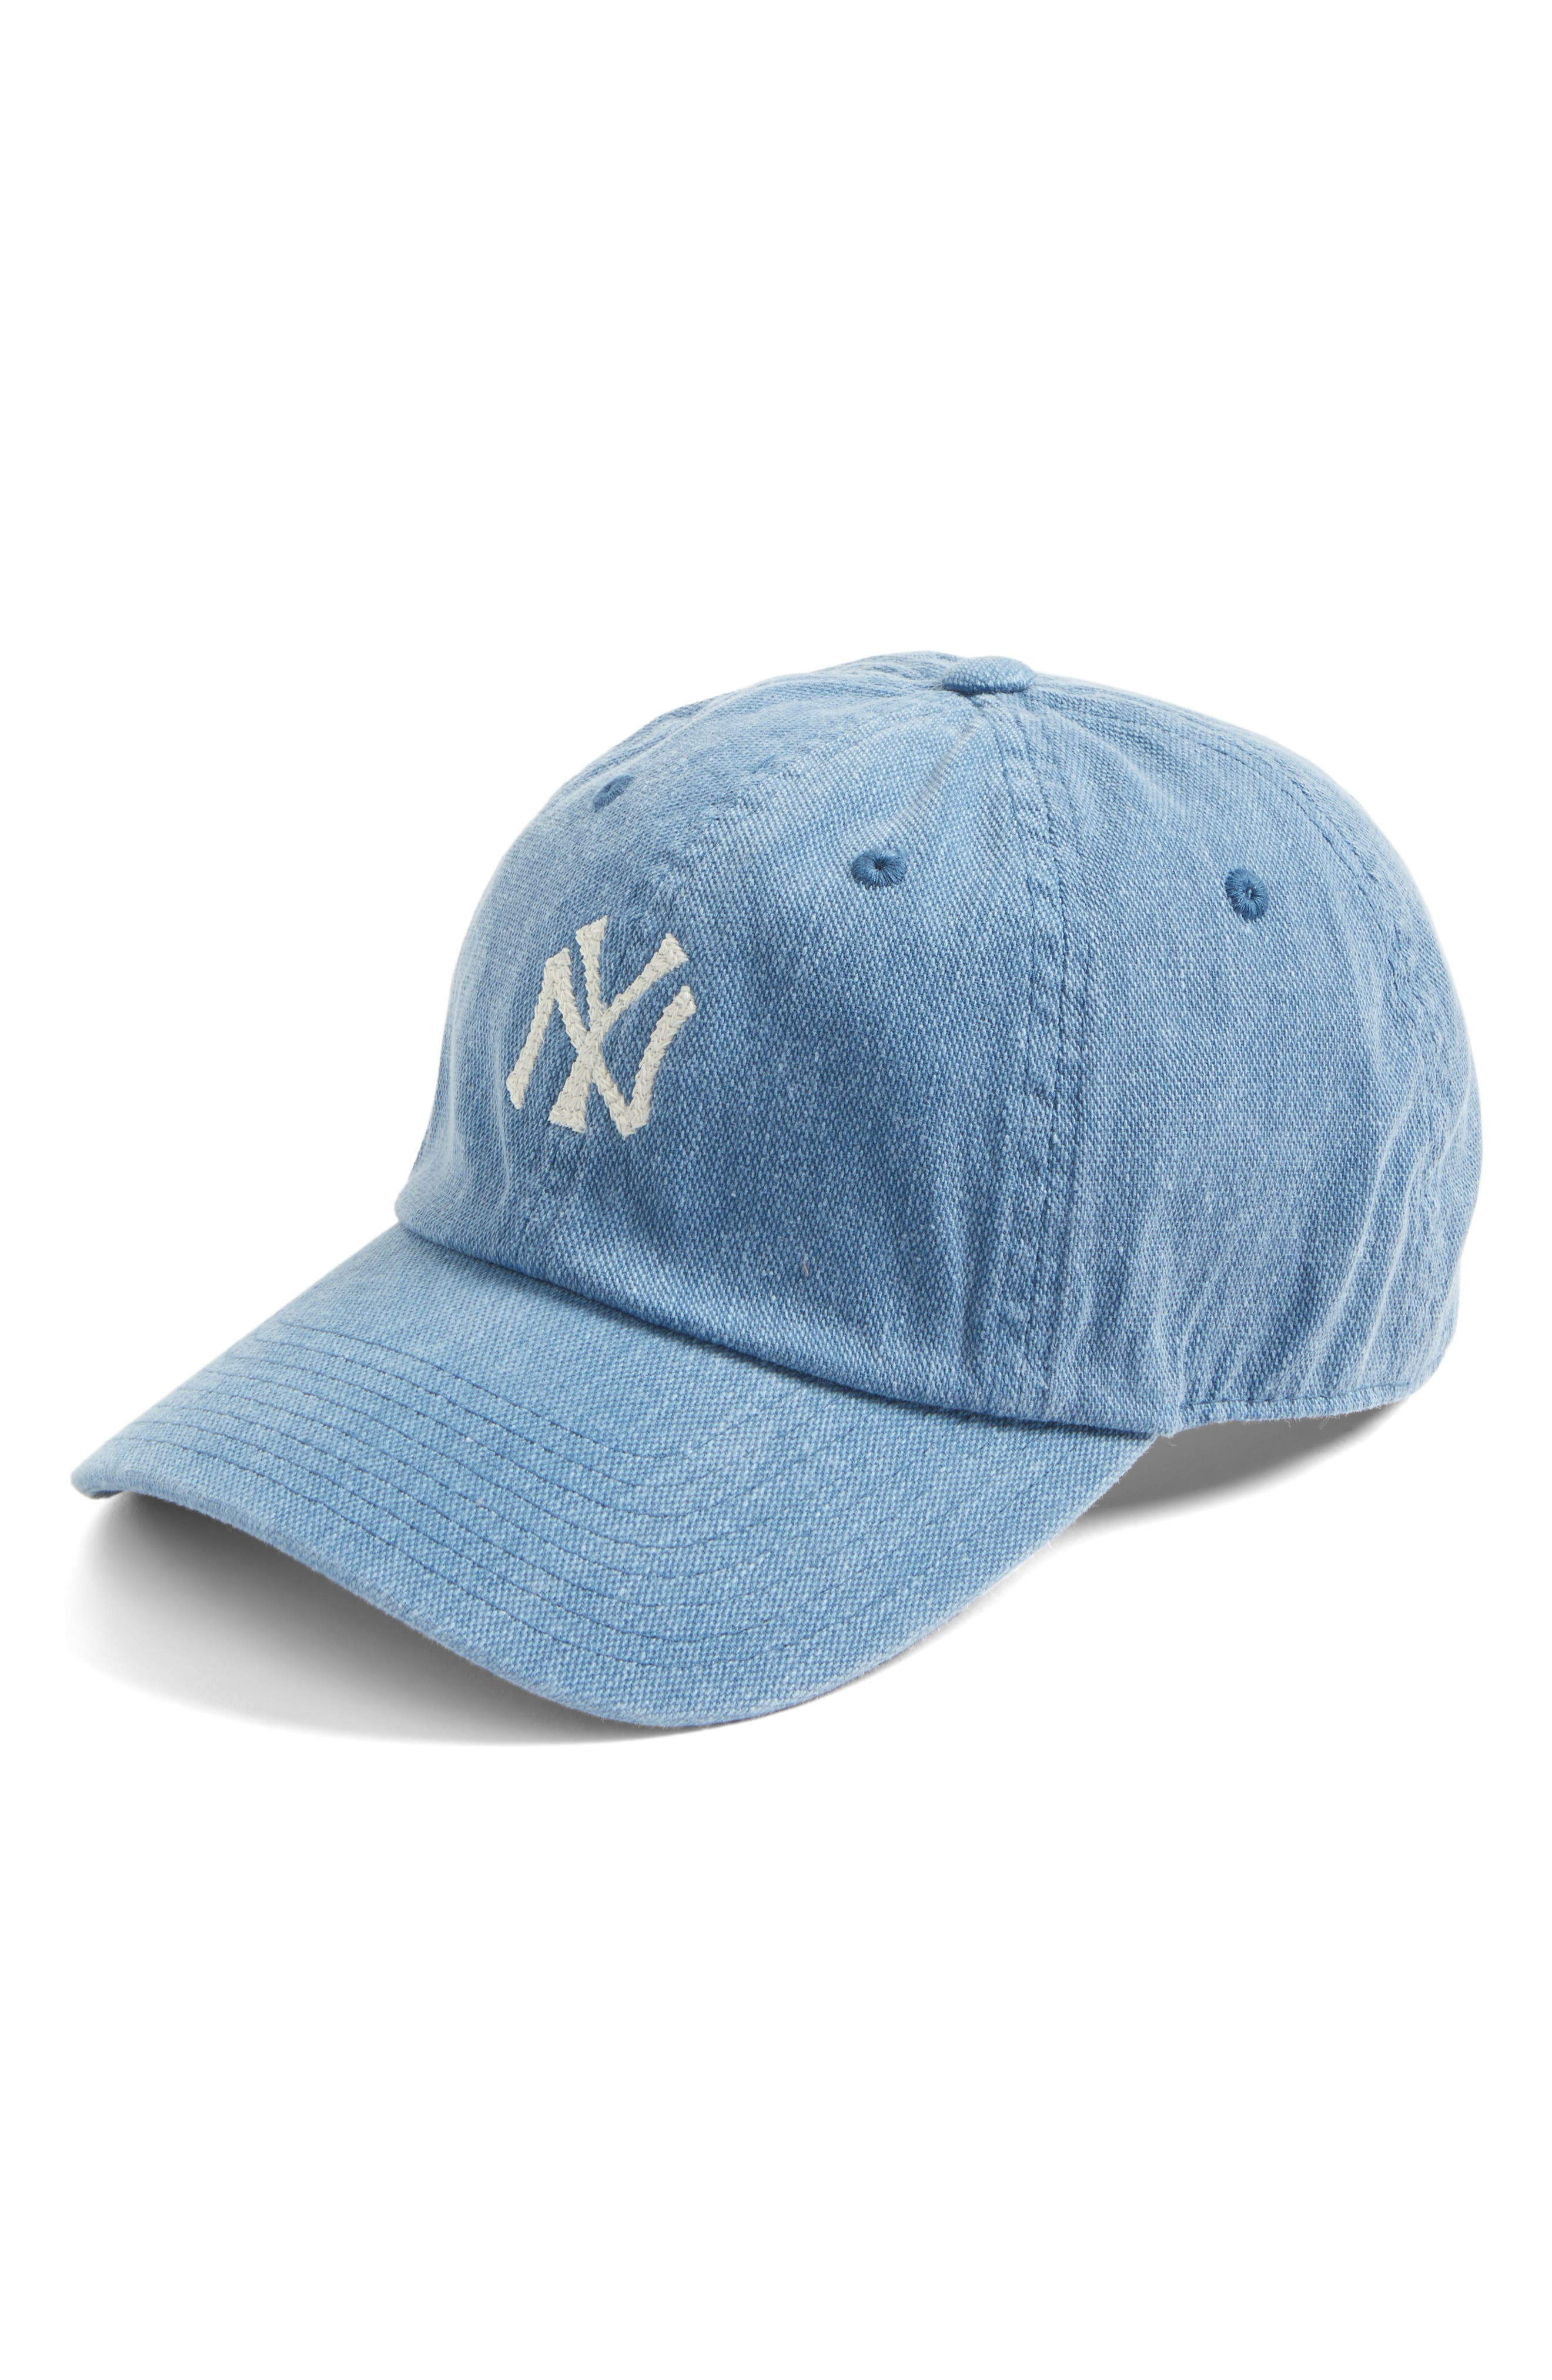 American Needle Danbury New York Yankees Baseball Cap